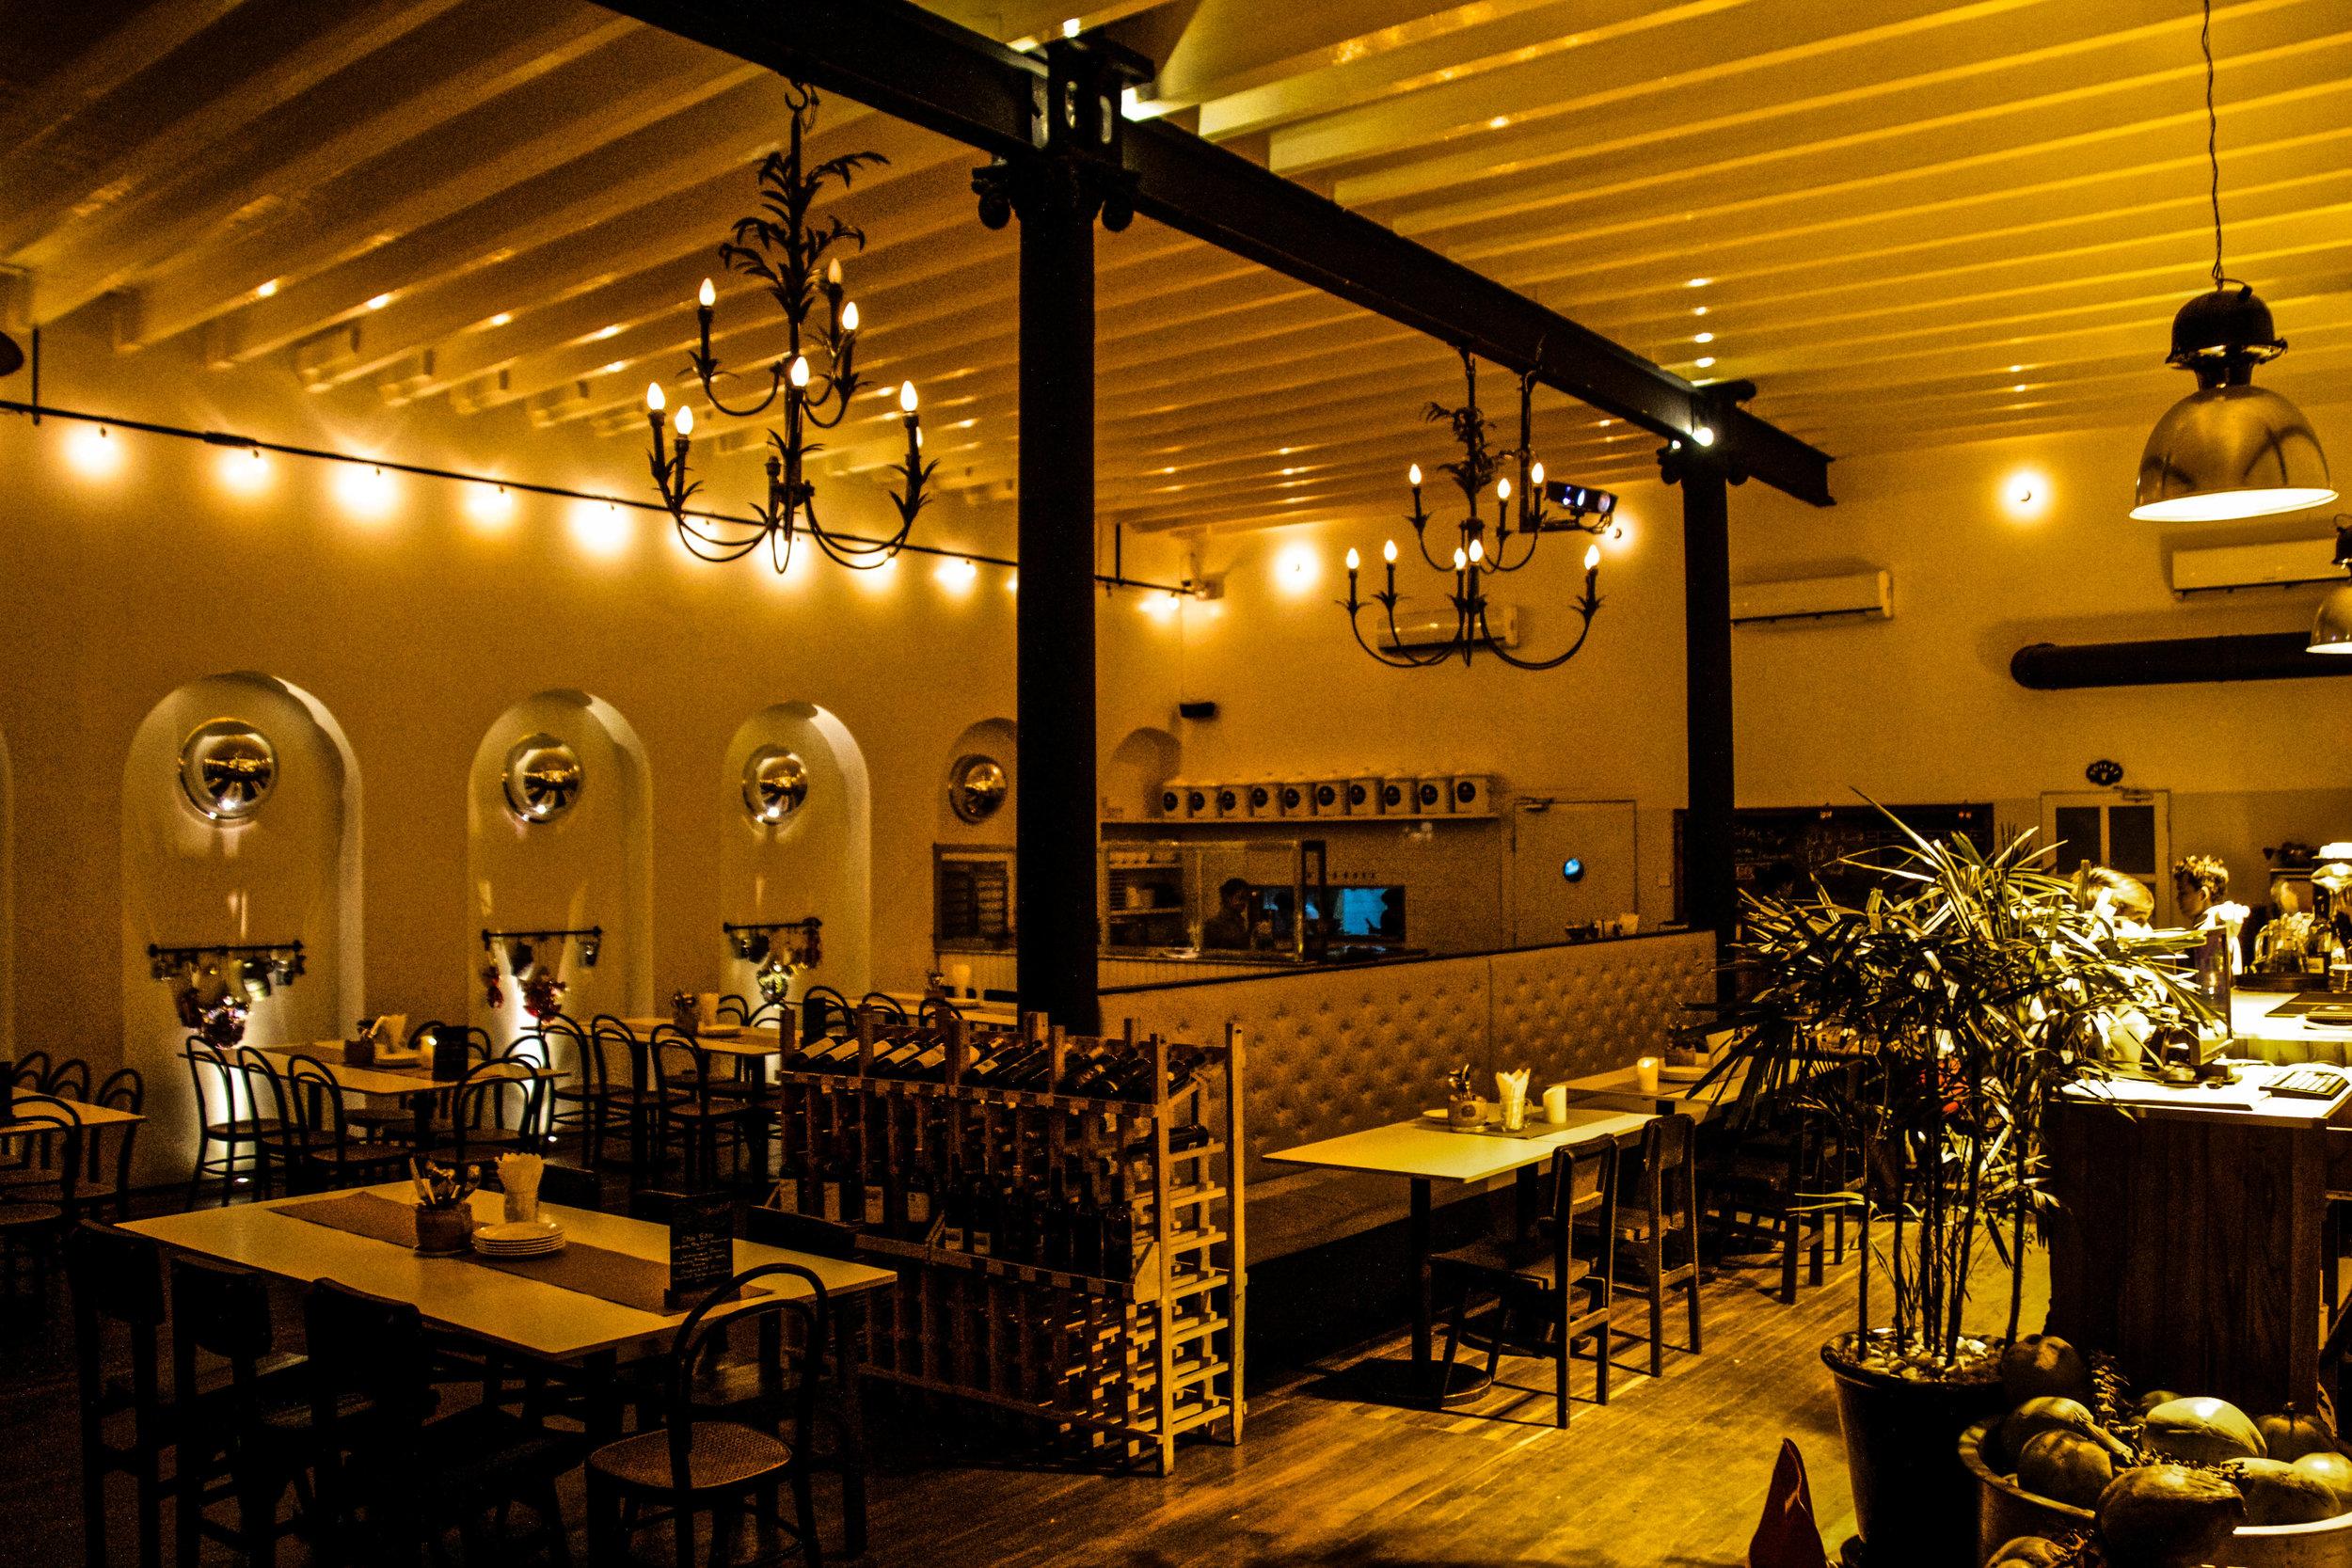 rangoon tea house restaurant yangon burma myanmar 2-2.jpg